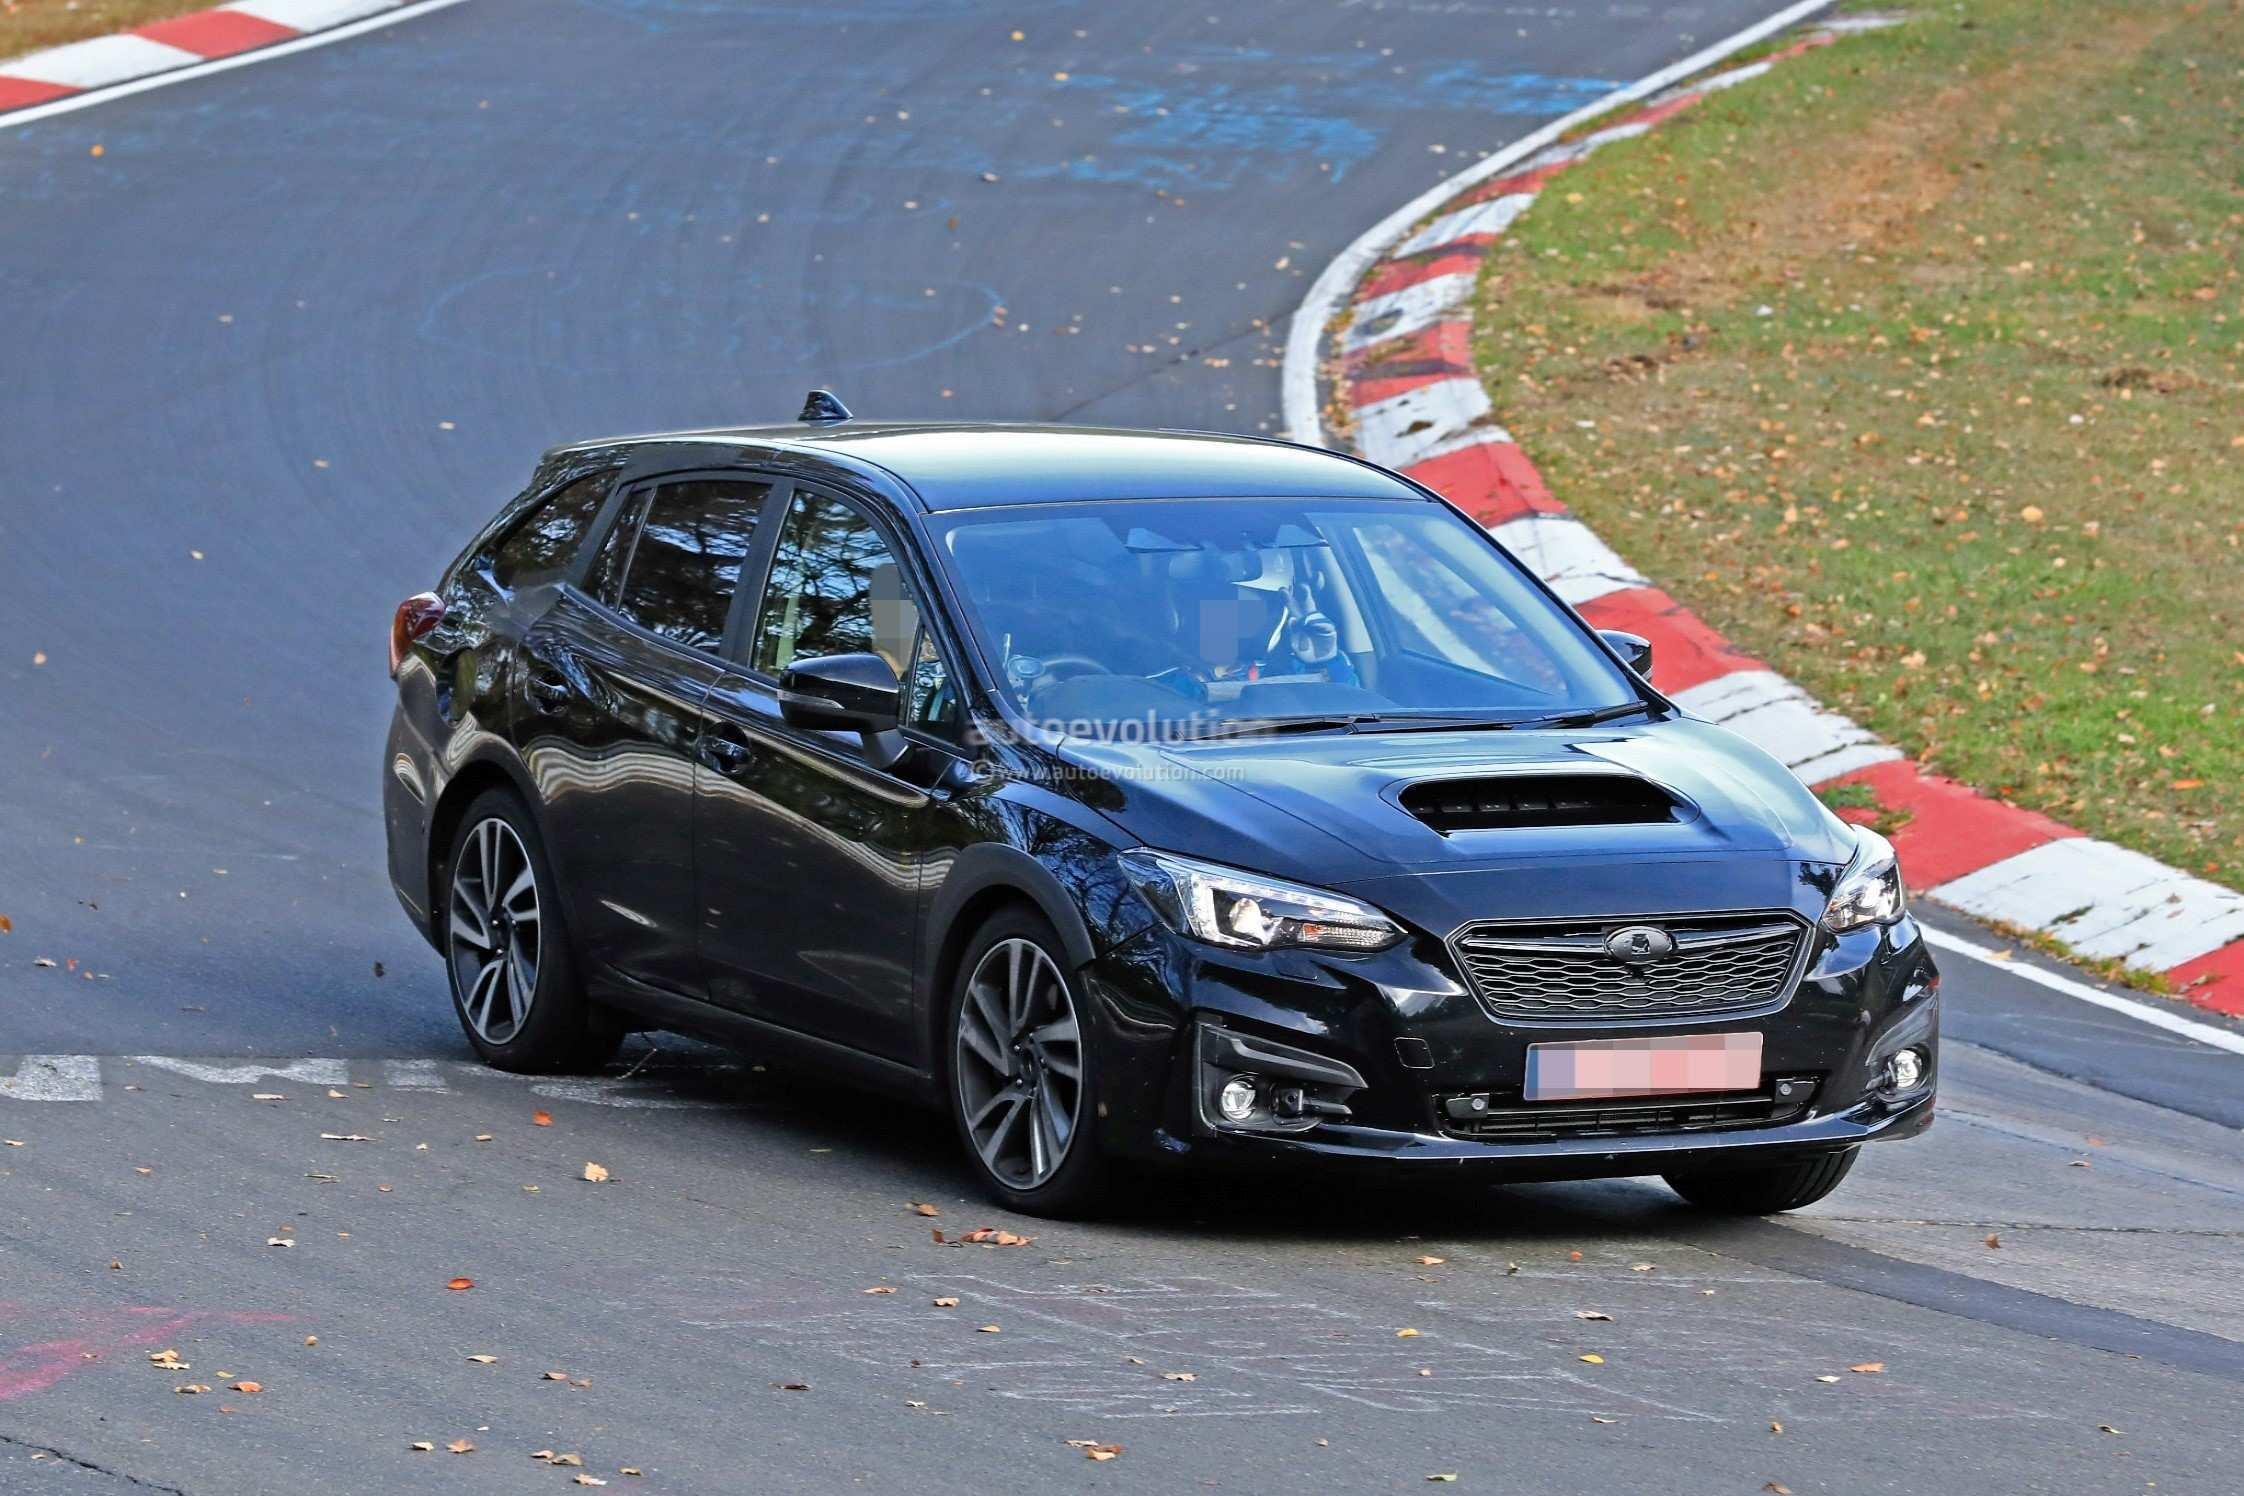 74 Concept of Subaru Lineup 2020 Performance with Subaru Lineup 2020